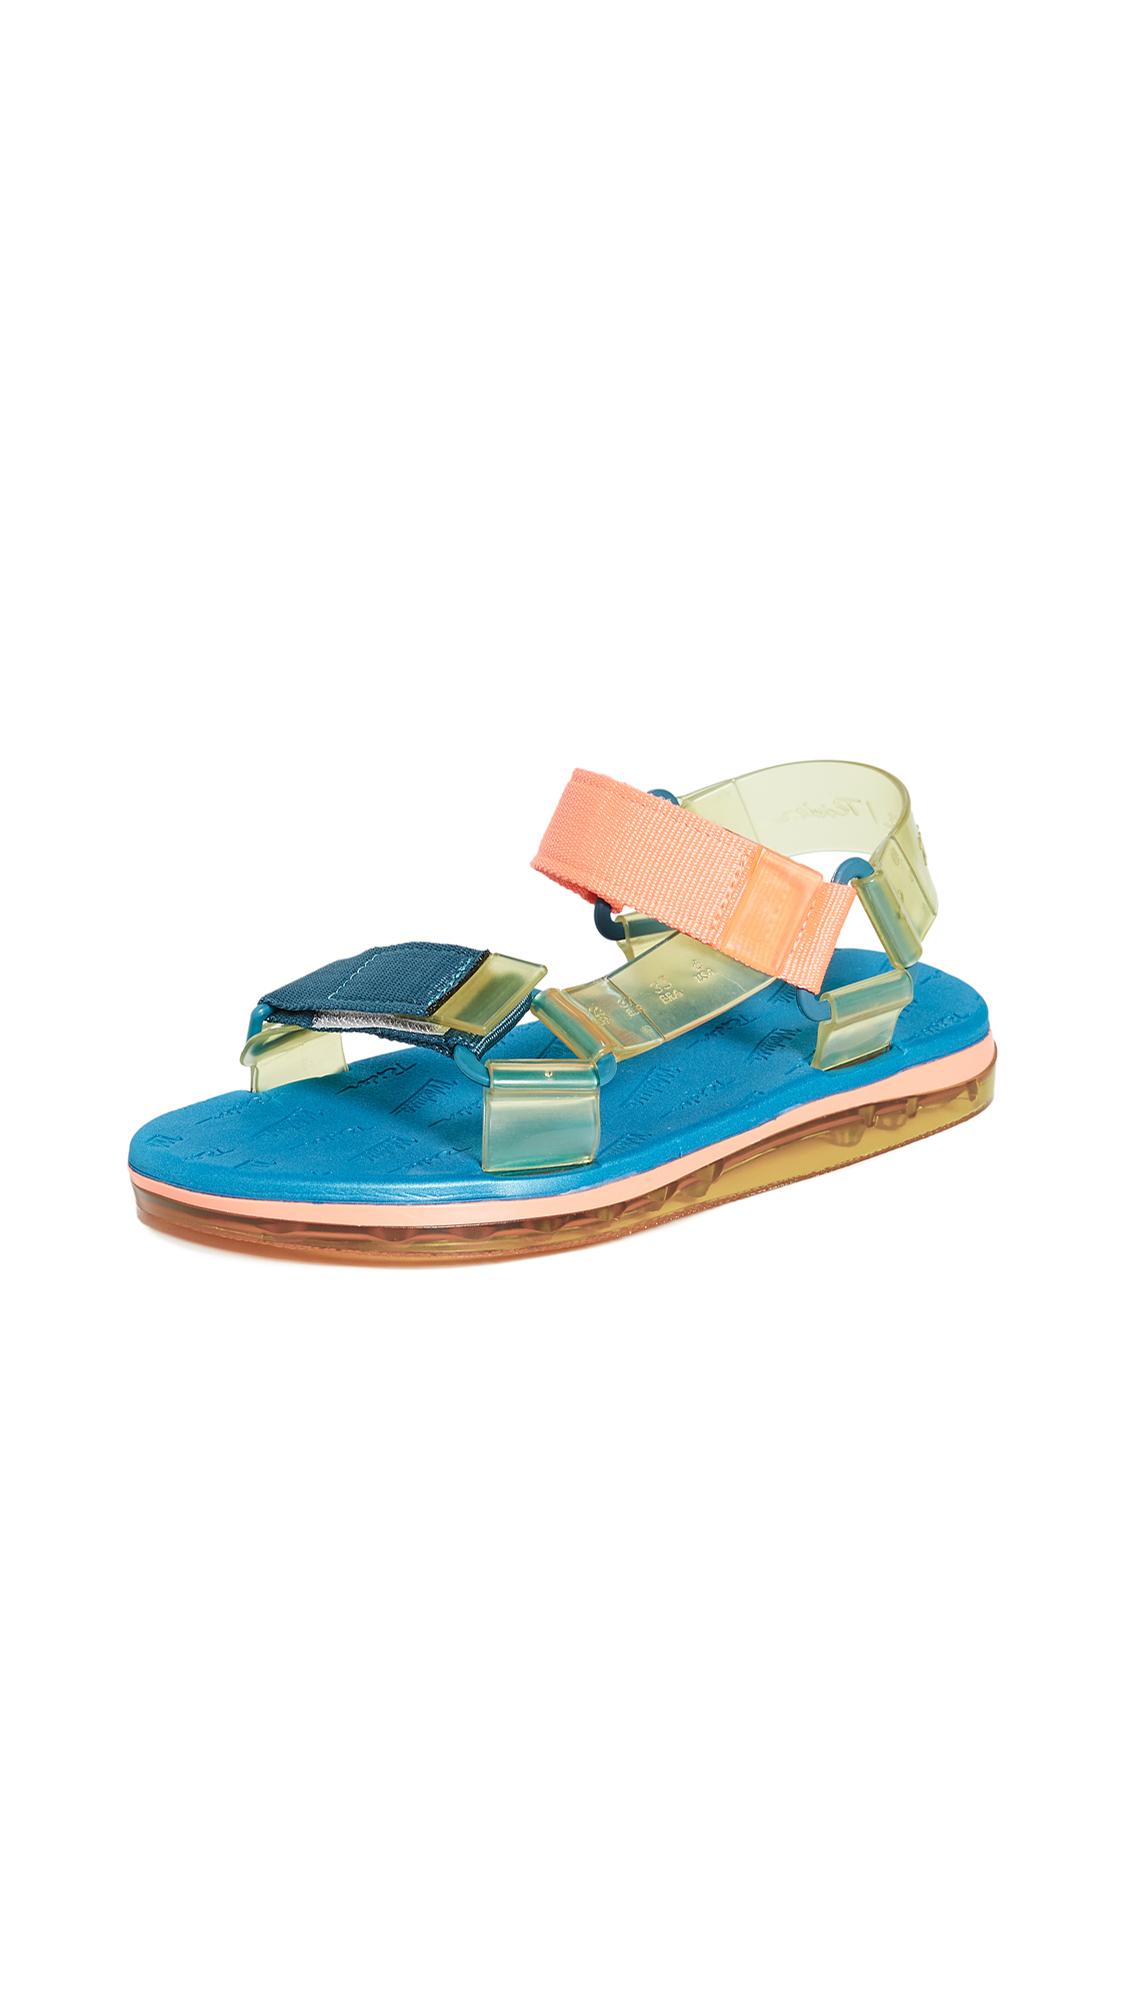 Buy Melissa Papete + Rider Sandals online, shop Melissa